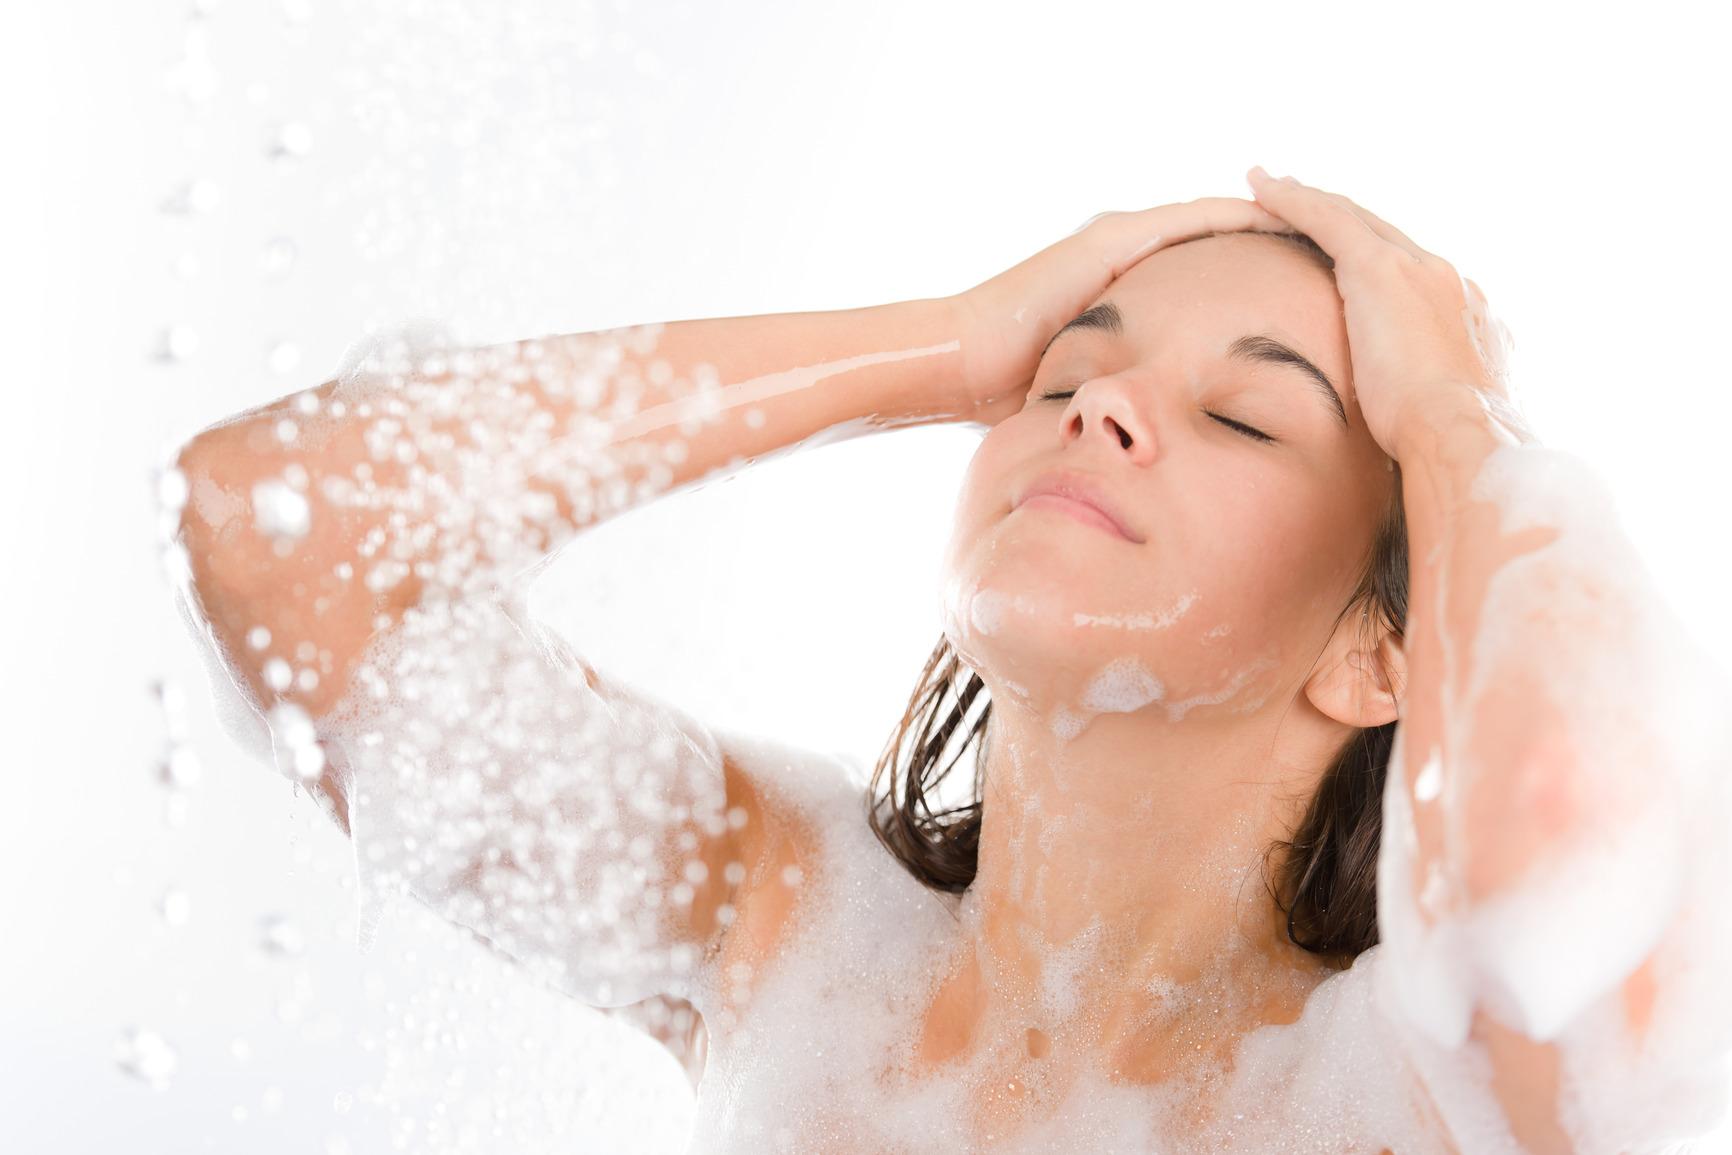 Sulfate free shampoos